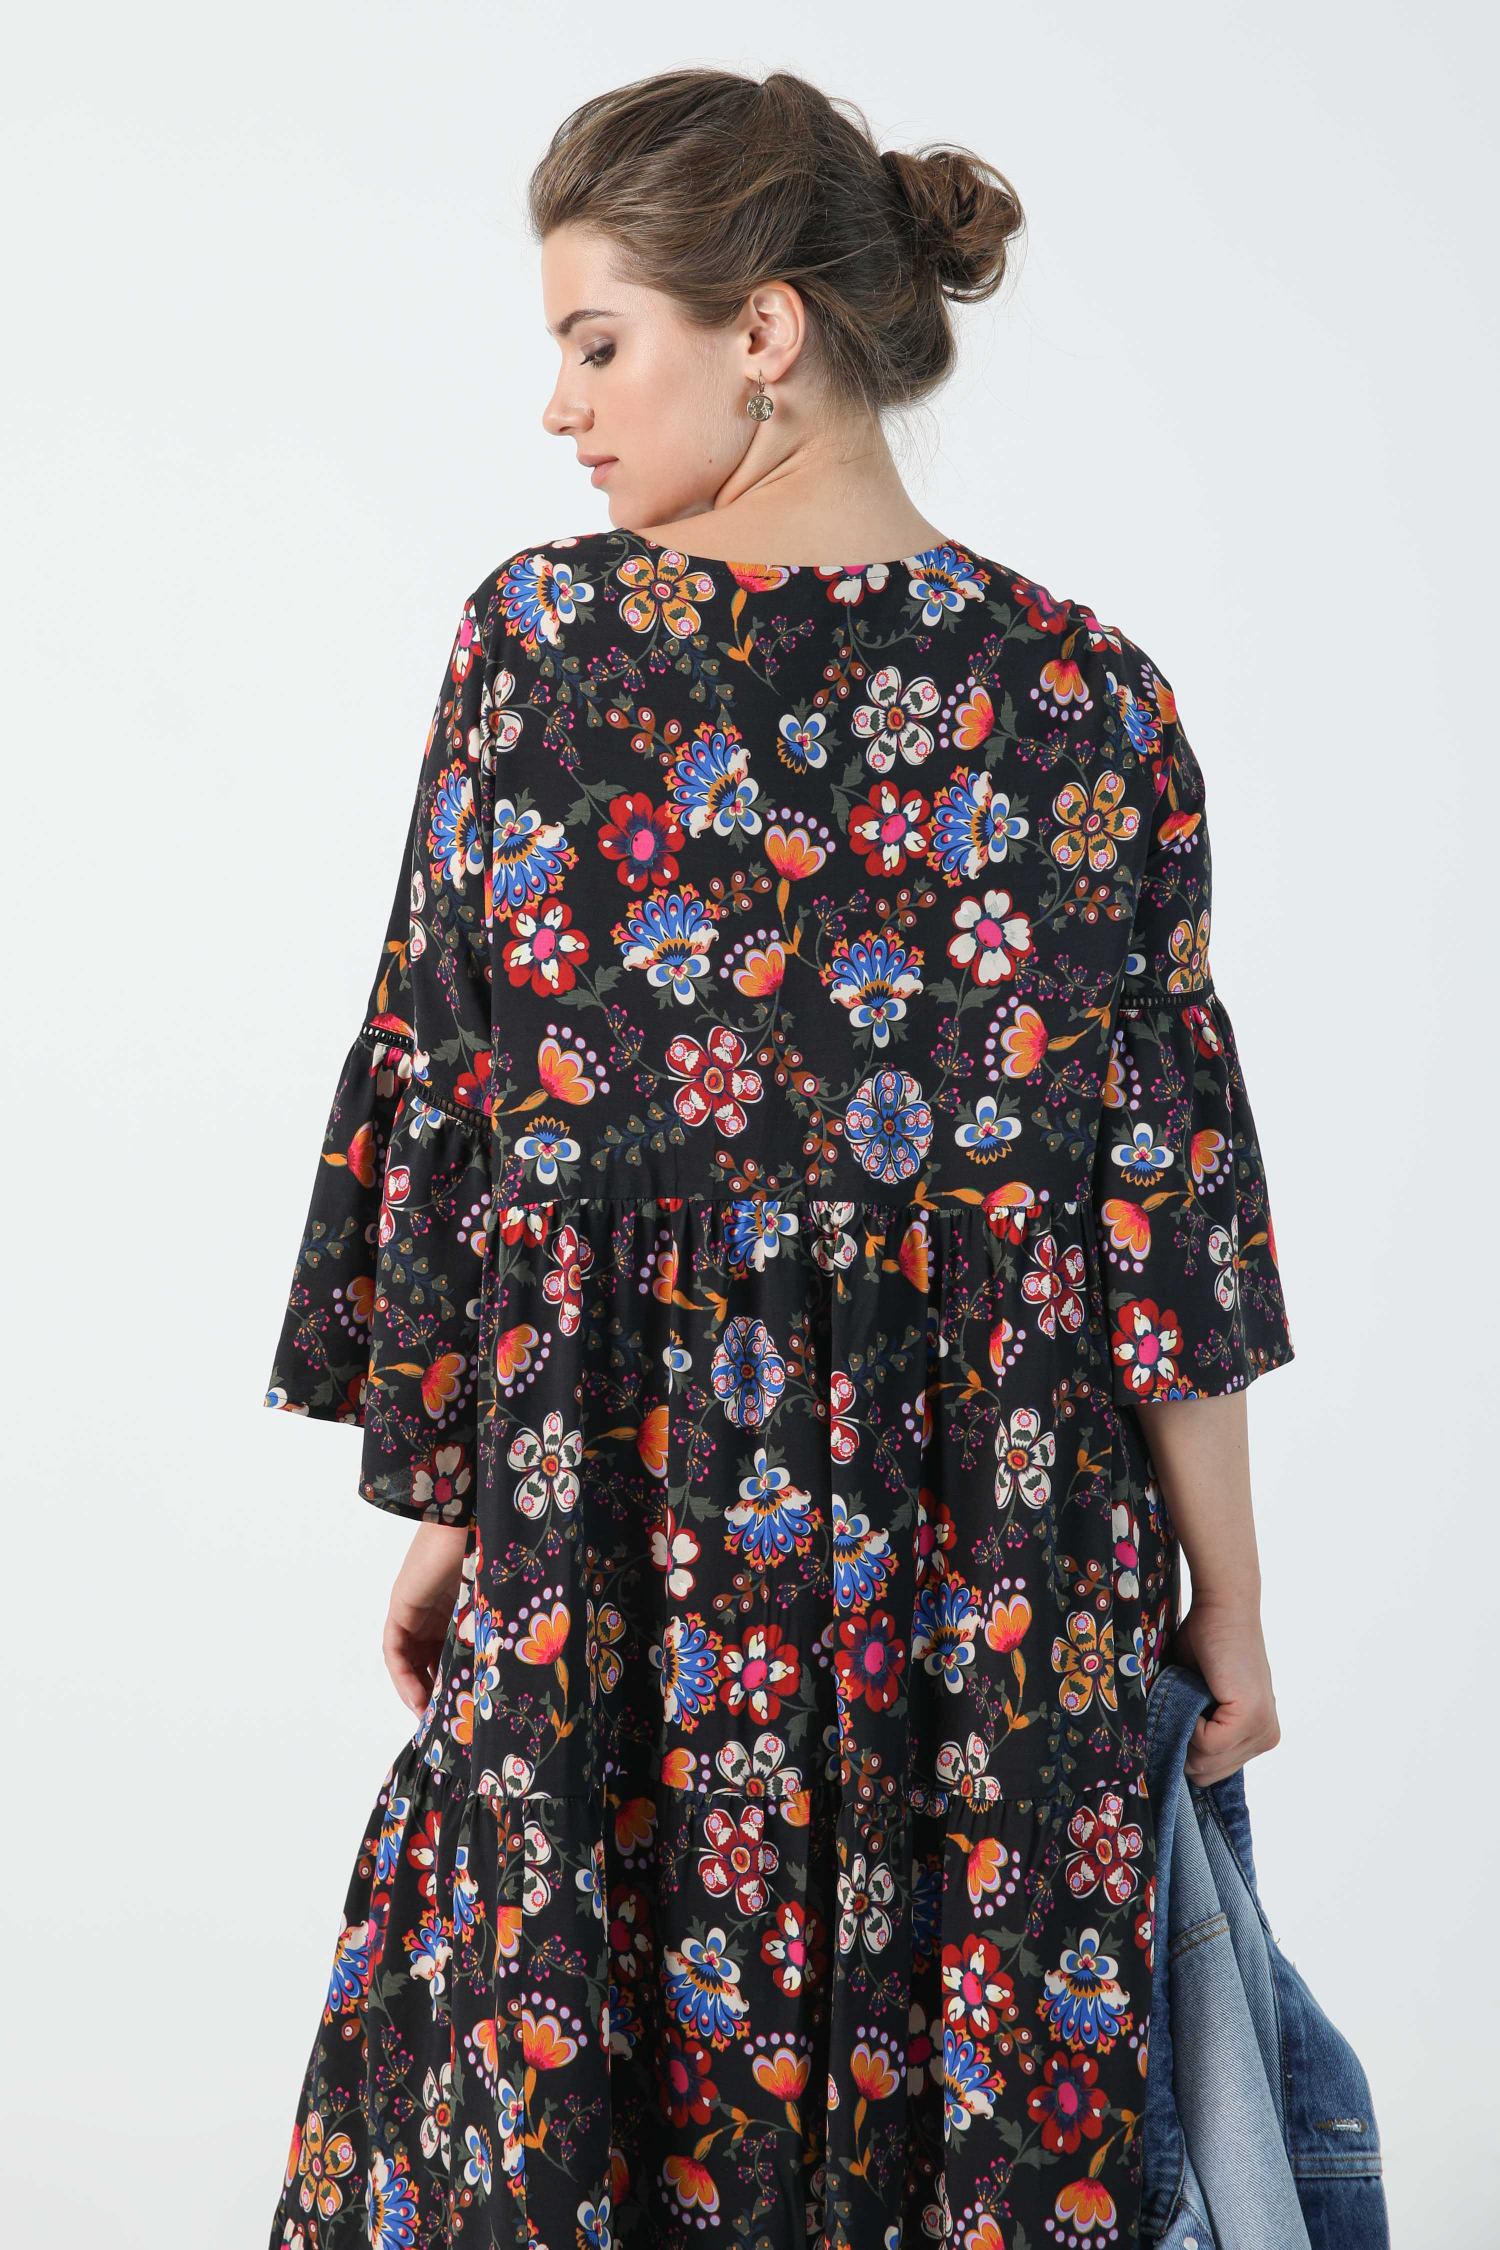 Bohemian style printed long dress in oeko-tex fabric